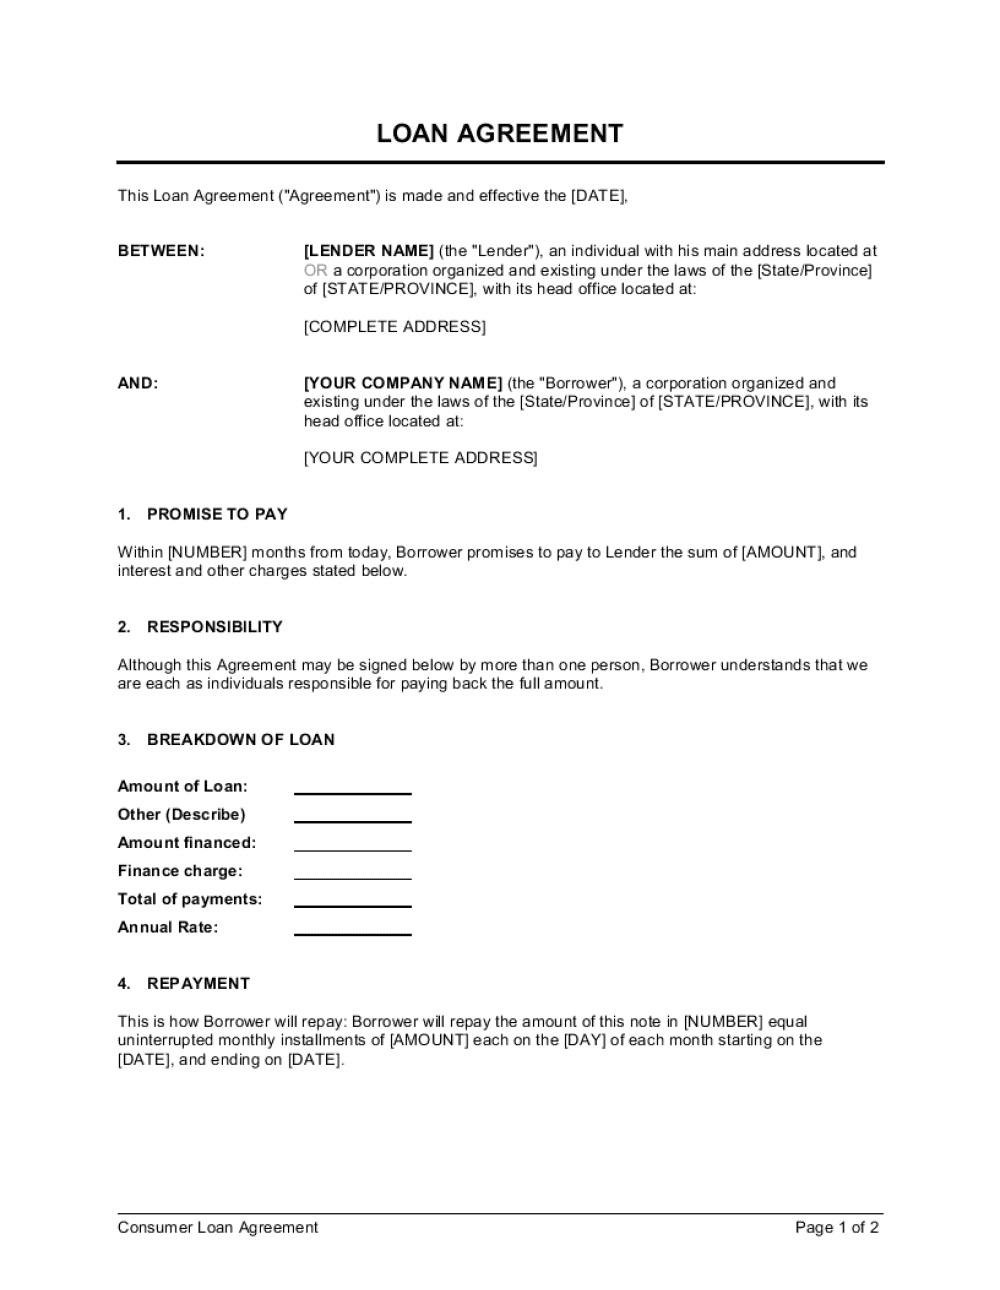 004 Singular Loan Agreement Template Free Photo  Word Nz Family UkFull